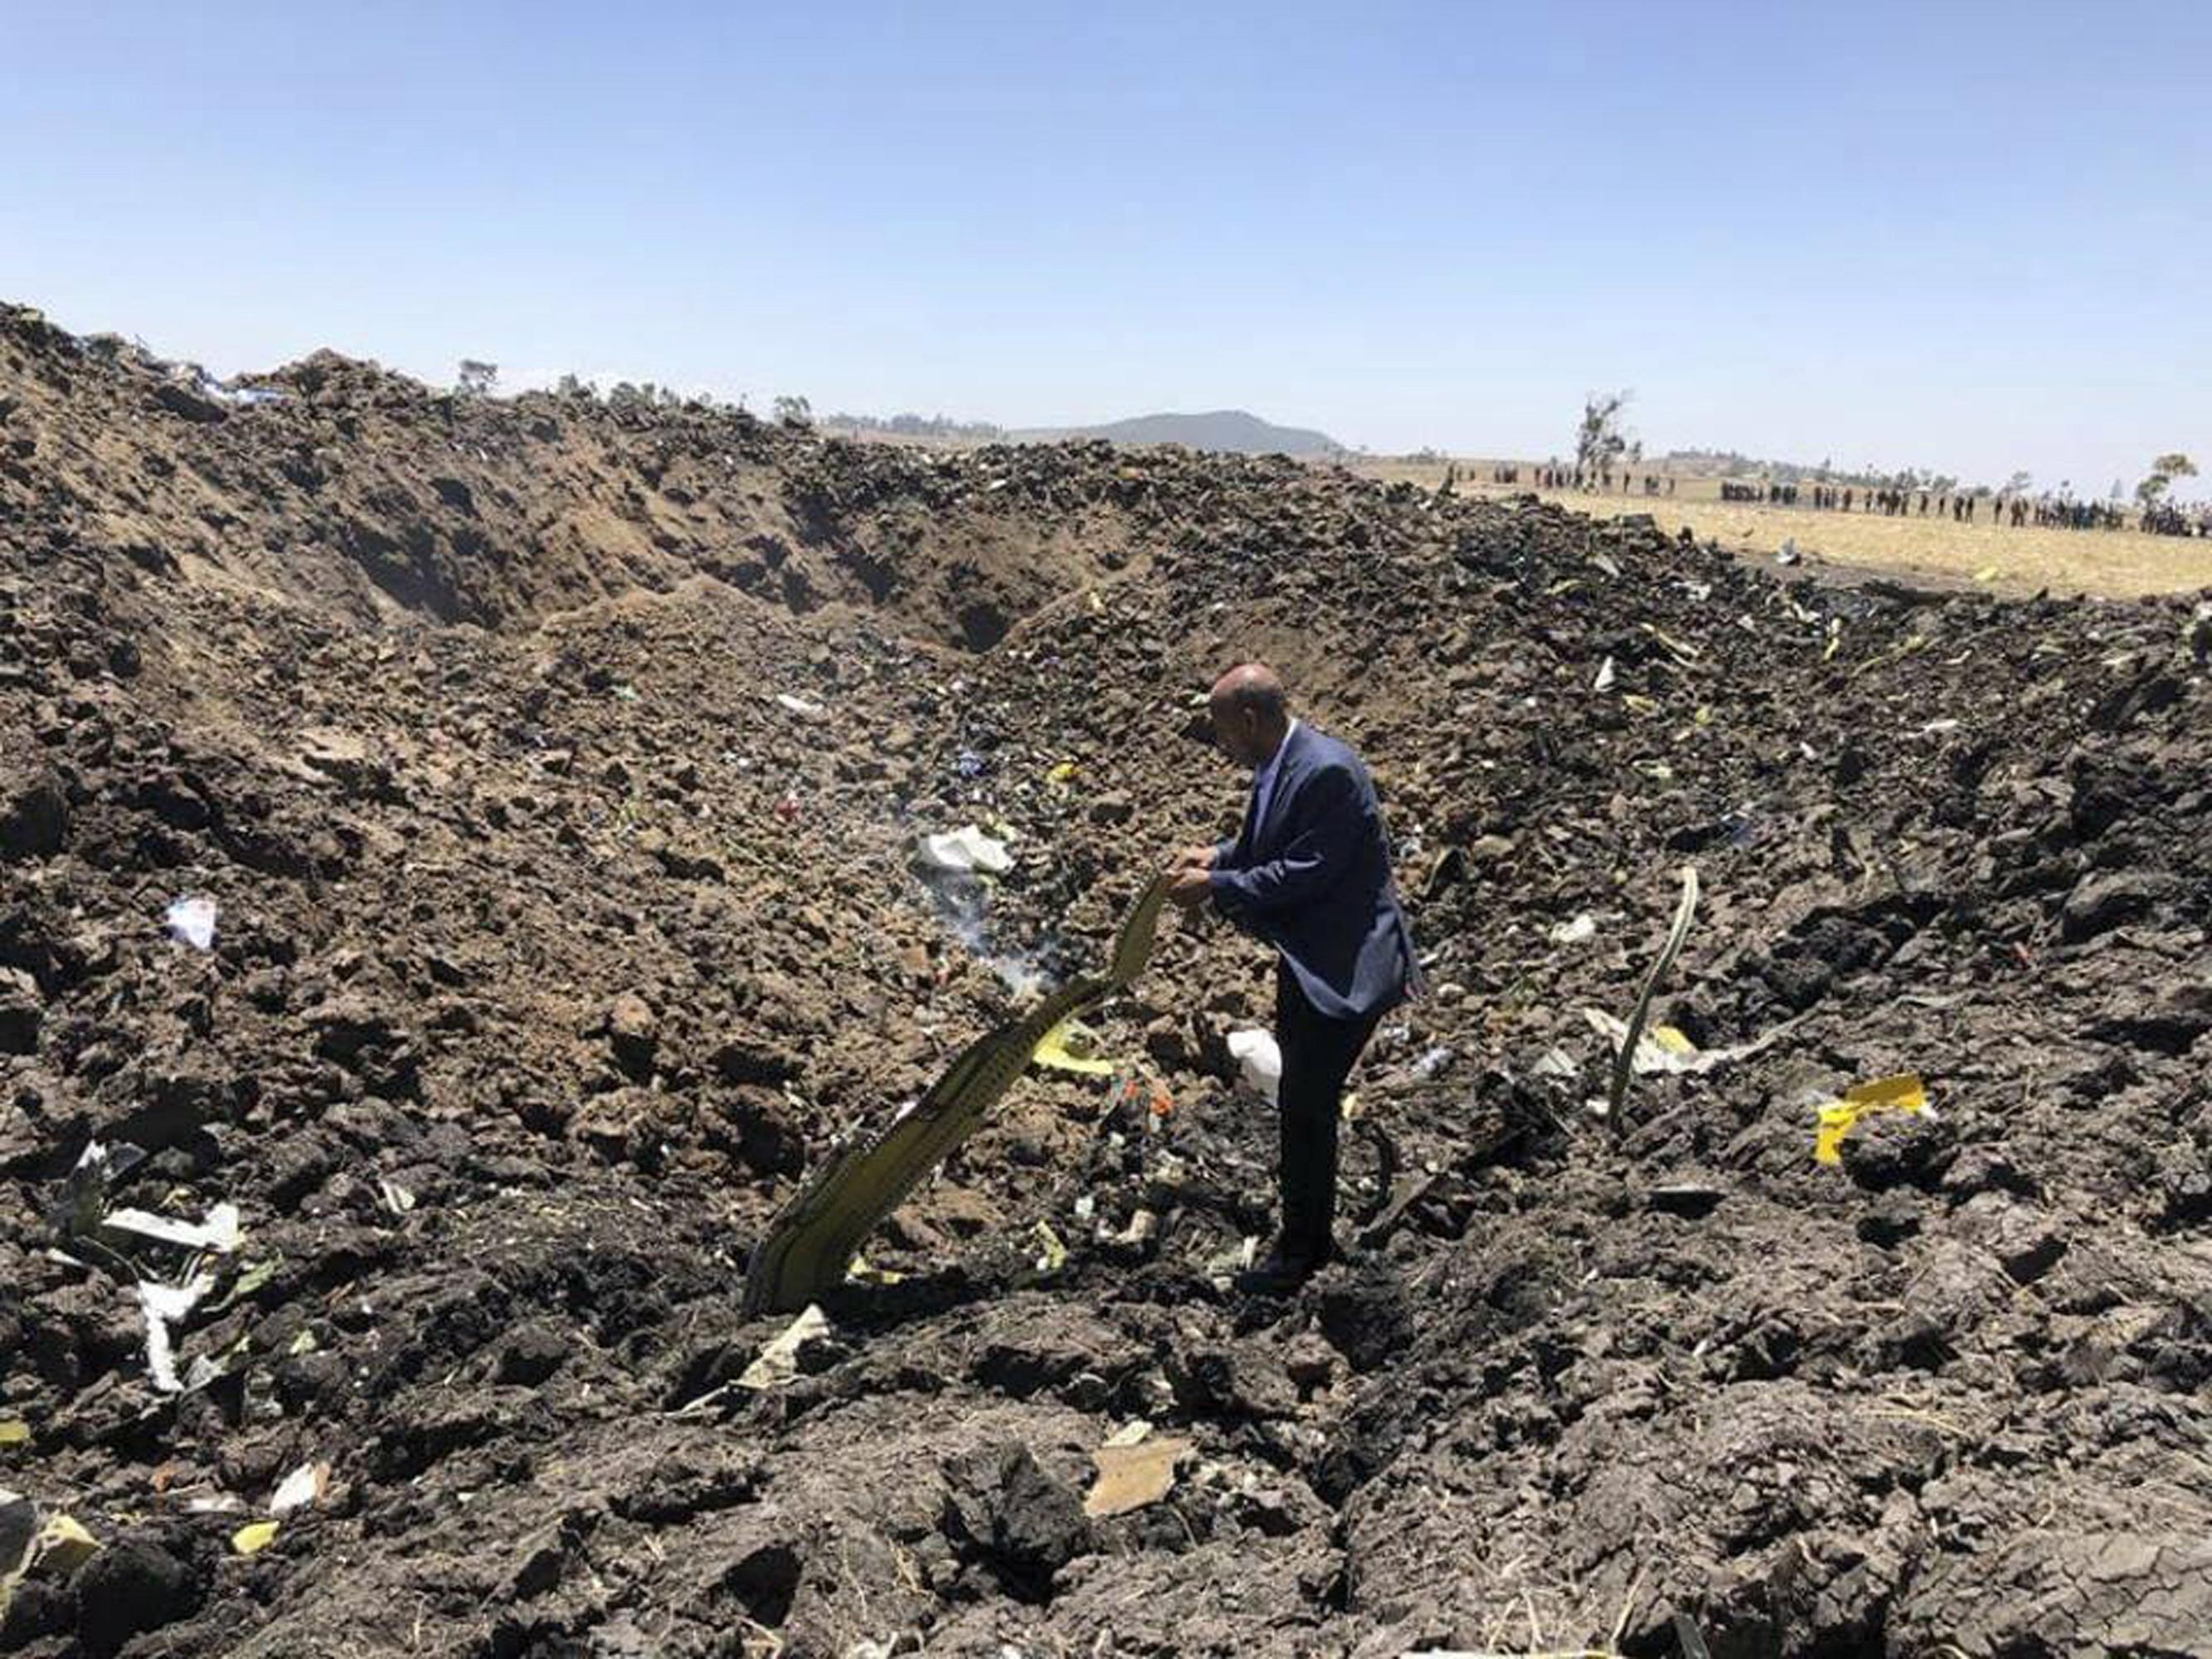 Ethiopian crash victims were aid workers, doctors, students